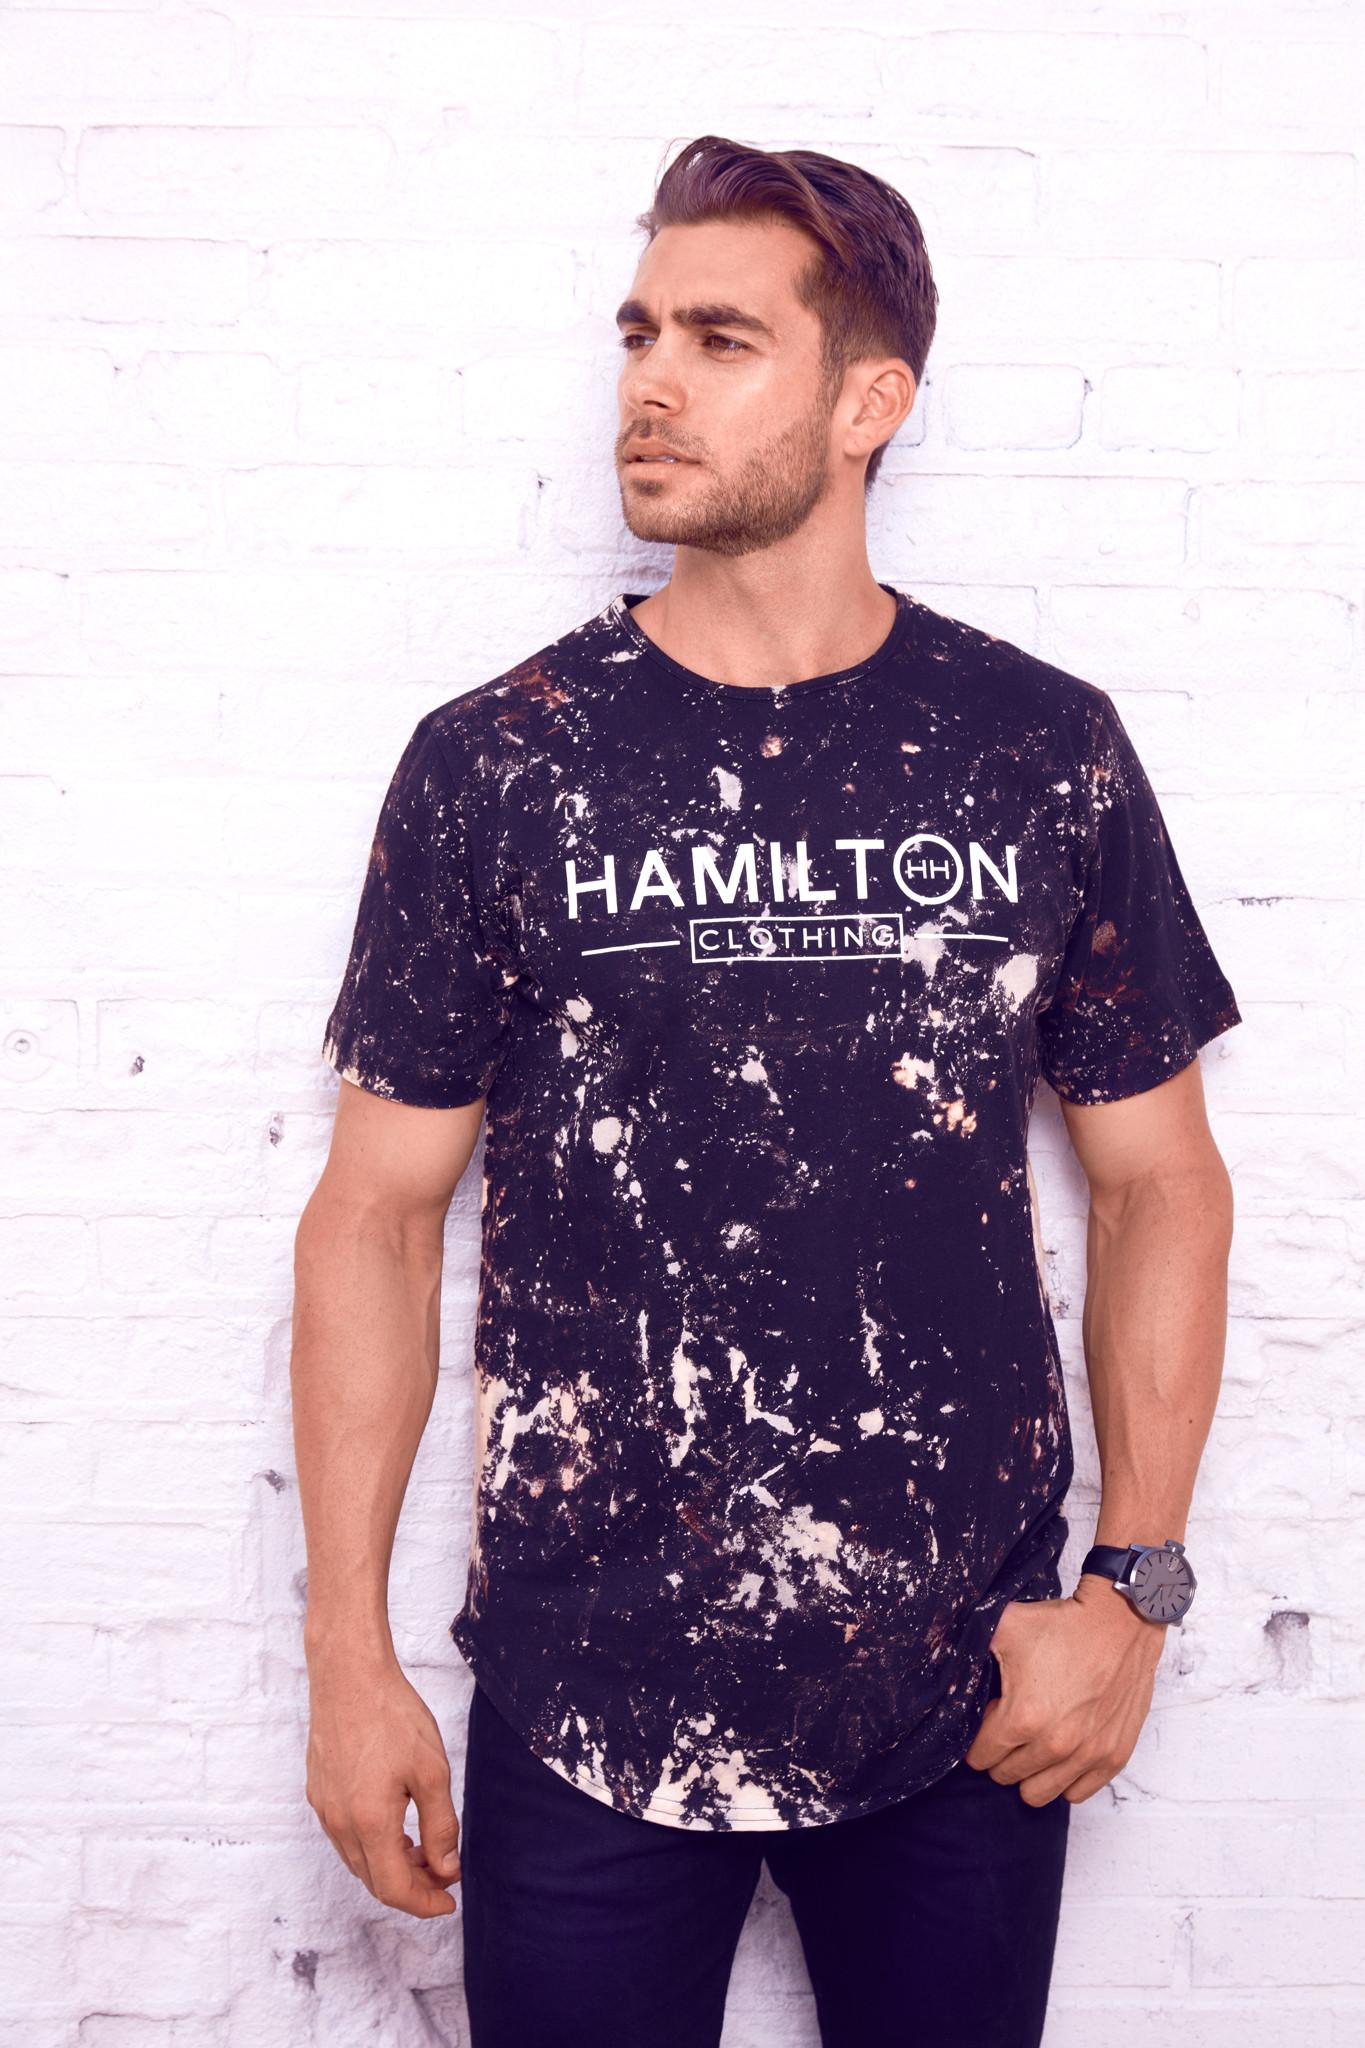 tampa mens streetwear boutique bleach tshirt hollywood hamilton clothing